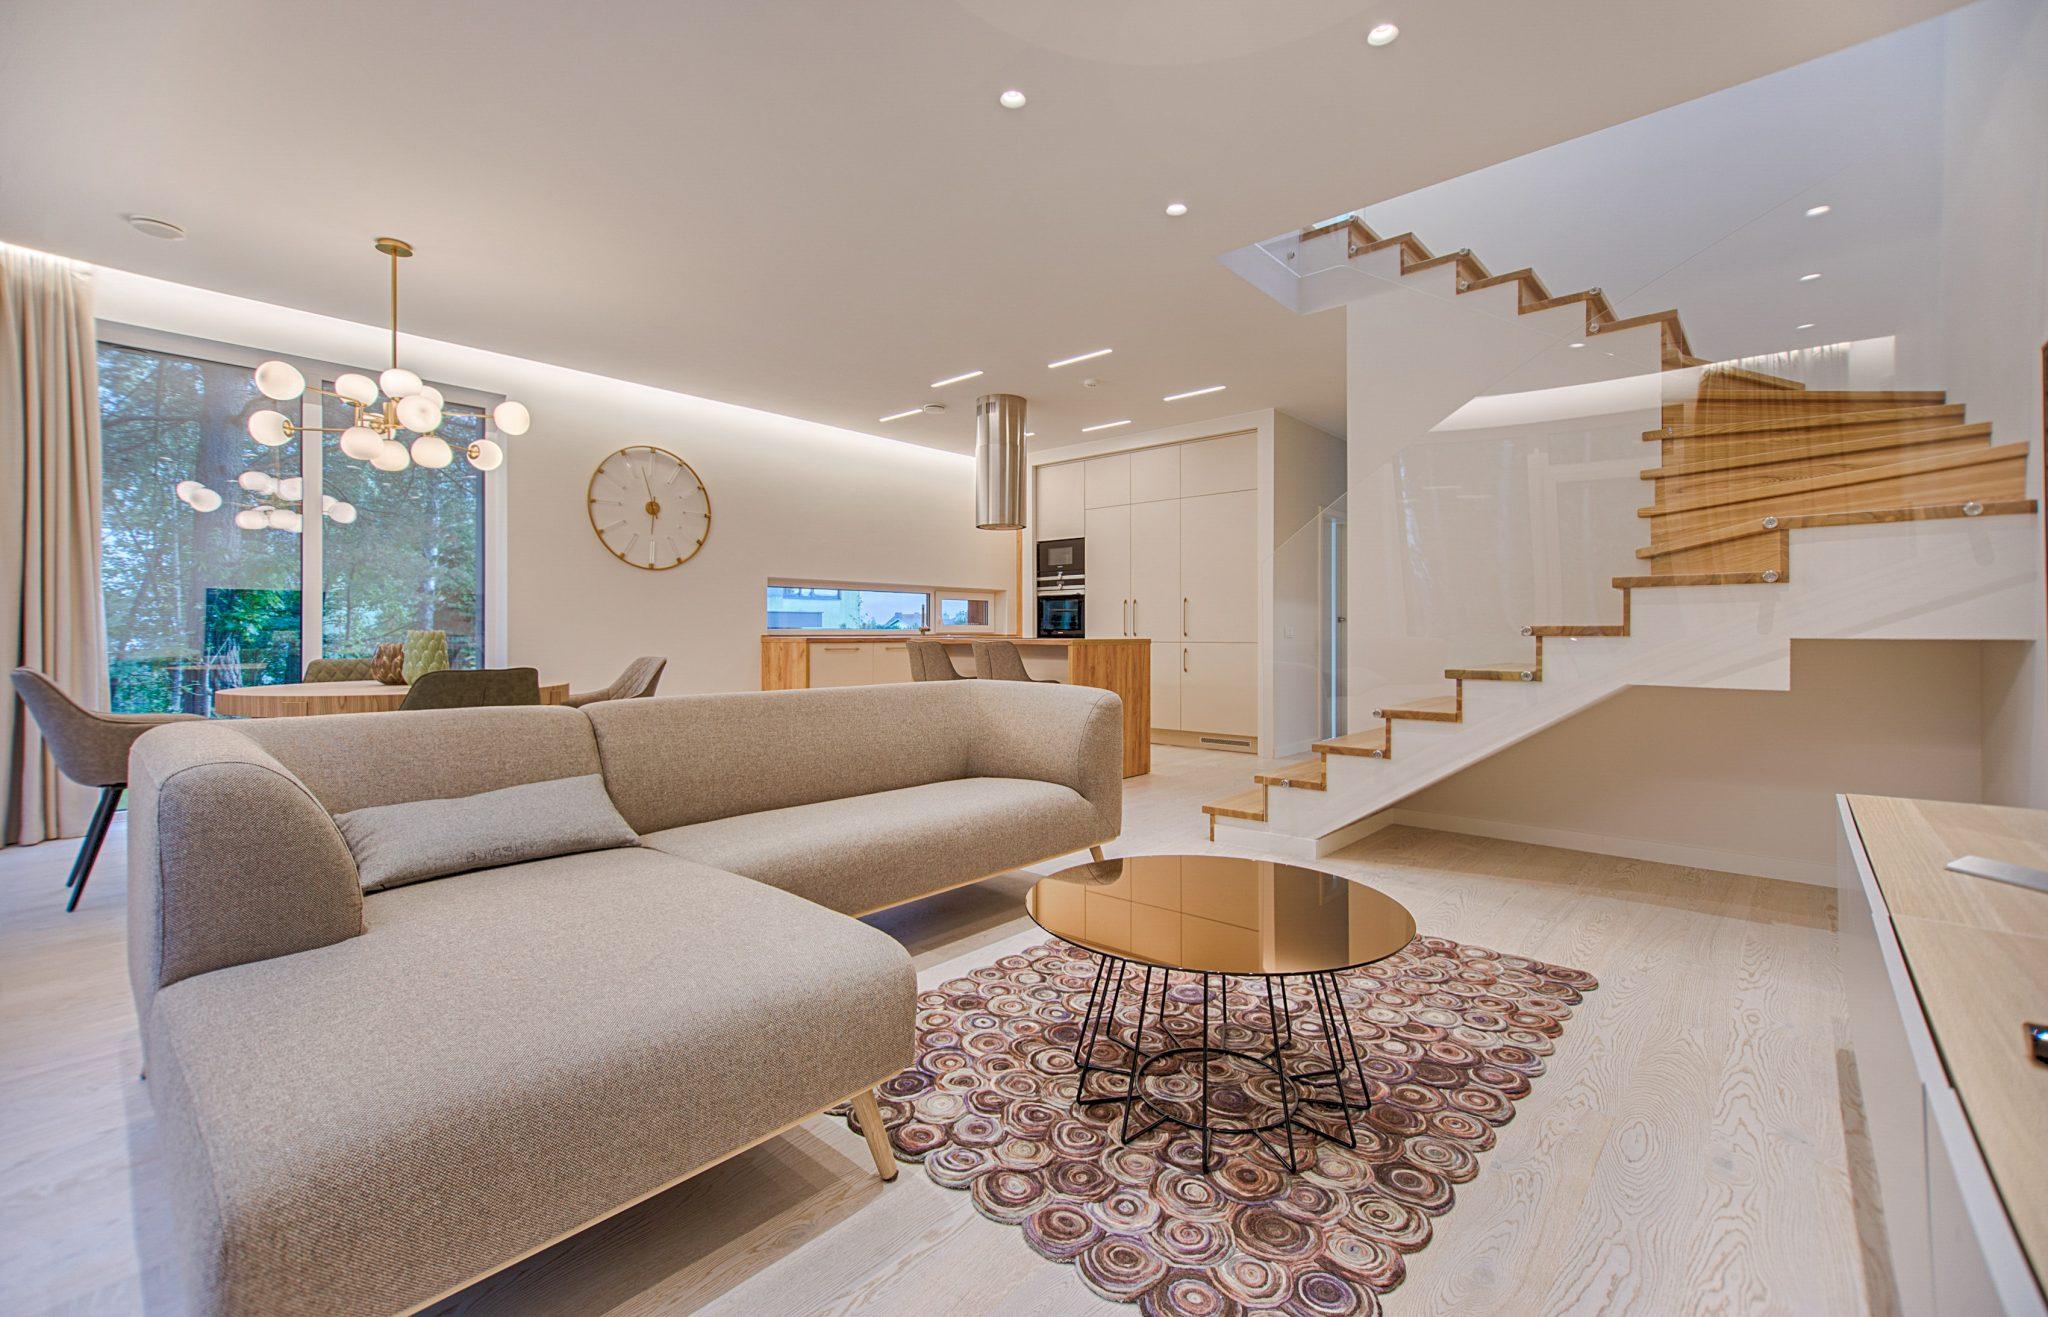 Best Interior Designer Websites And Blogs